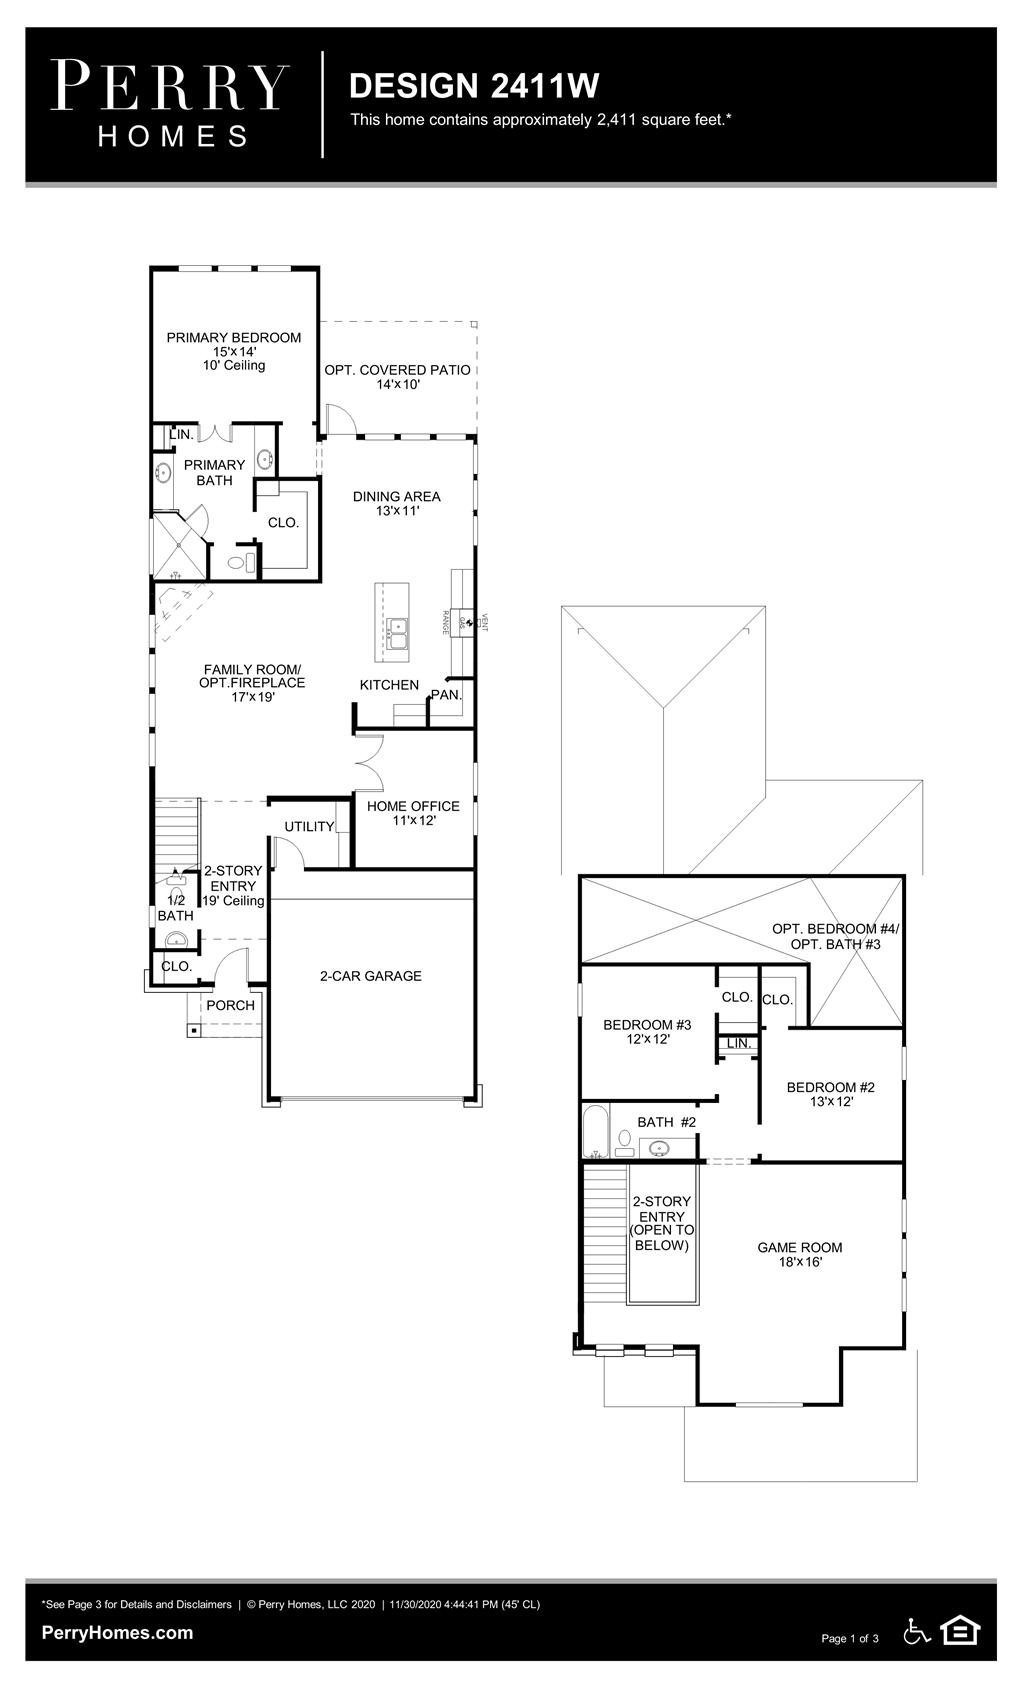 Floor Plan for 2411W